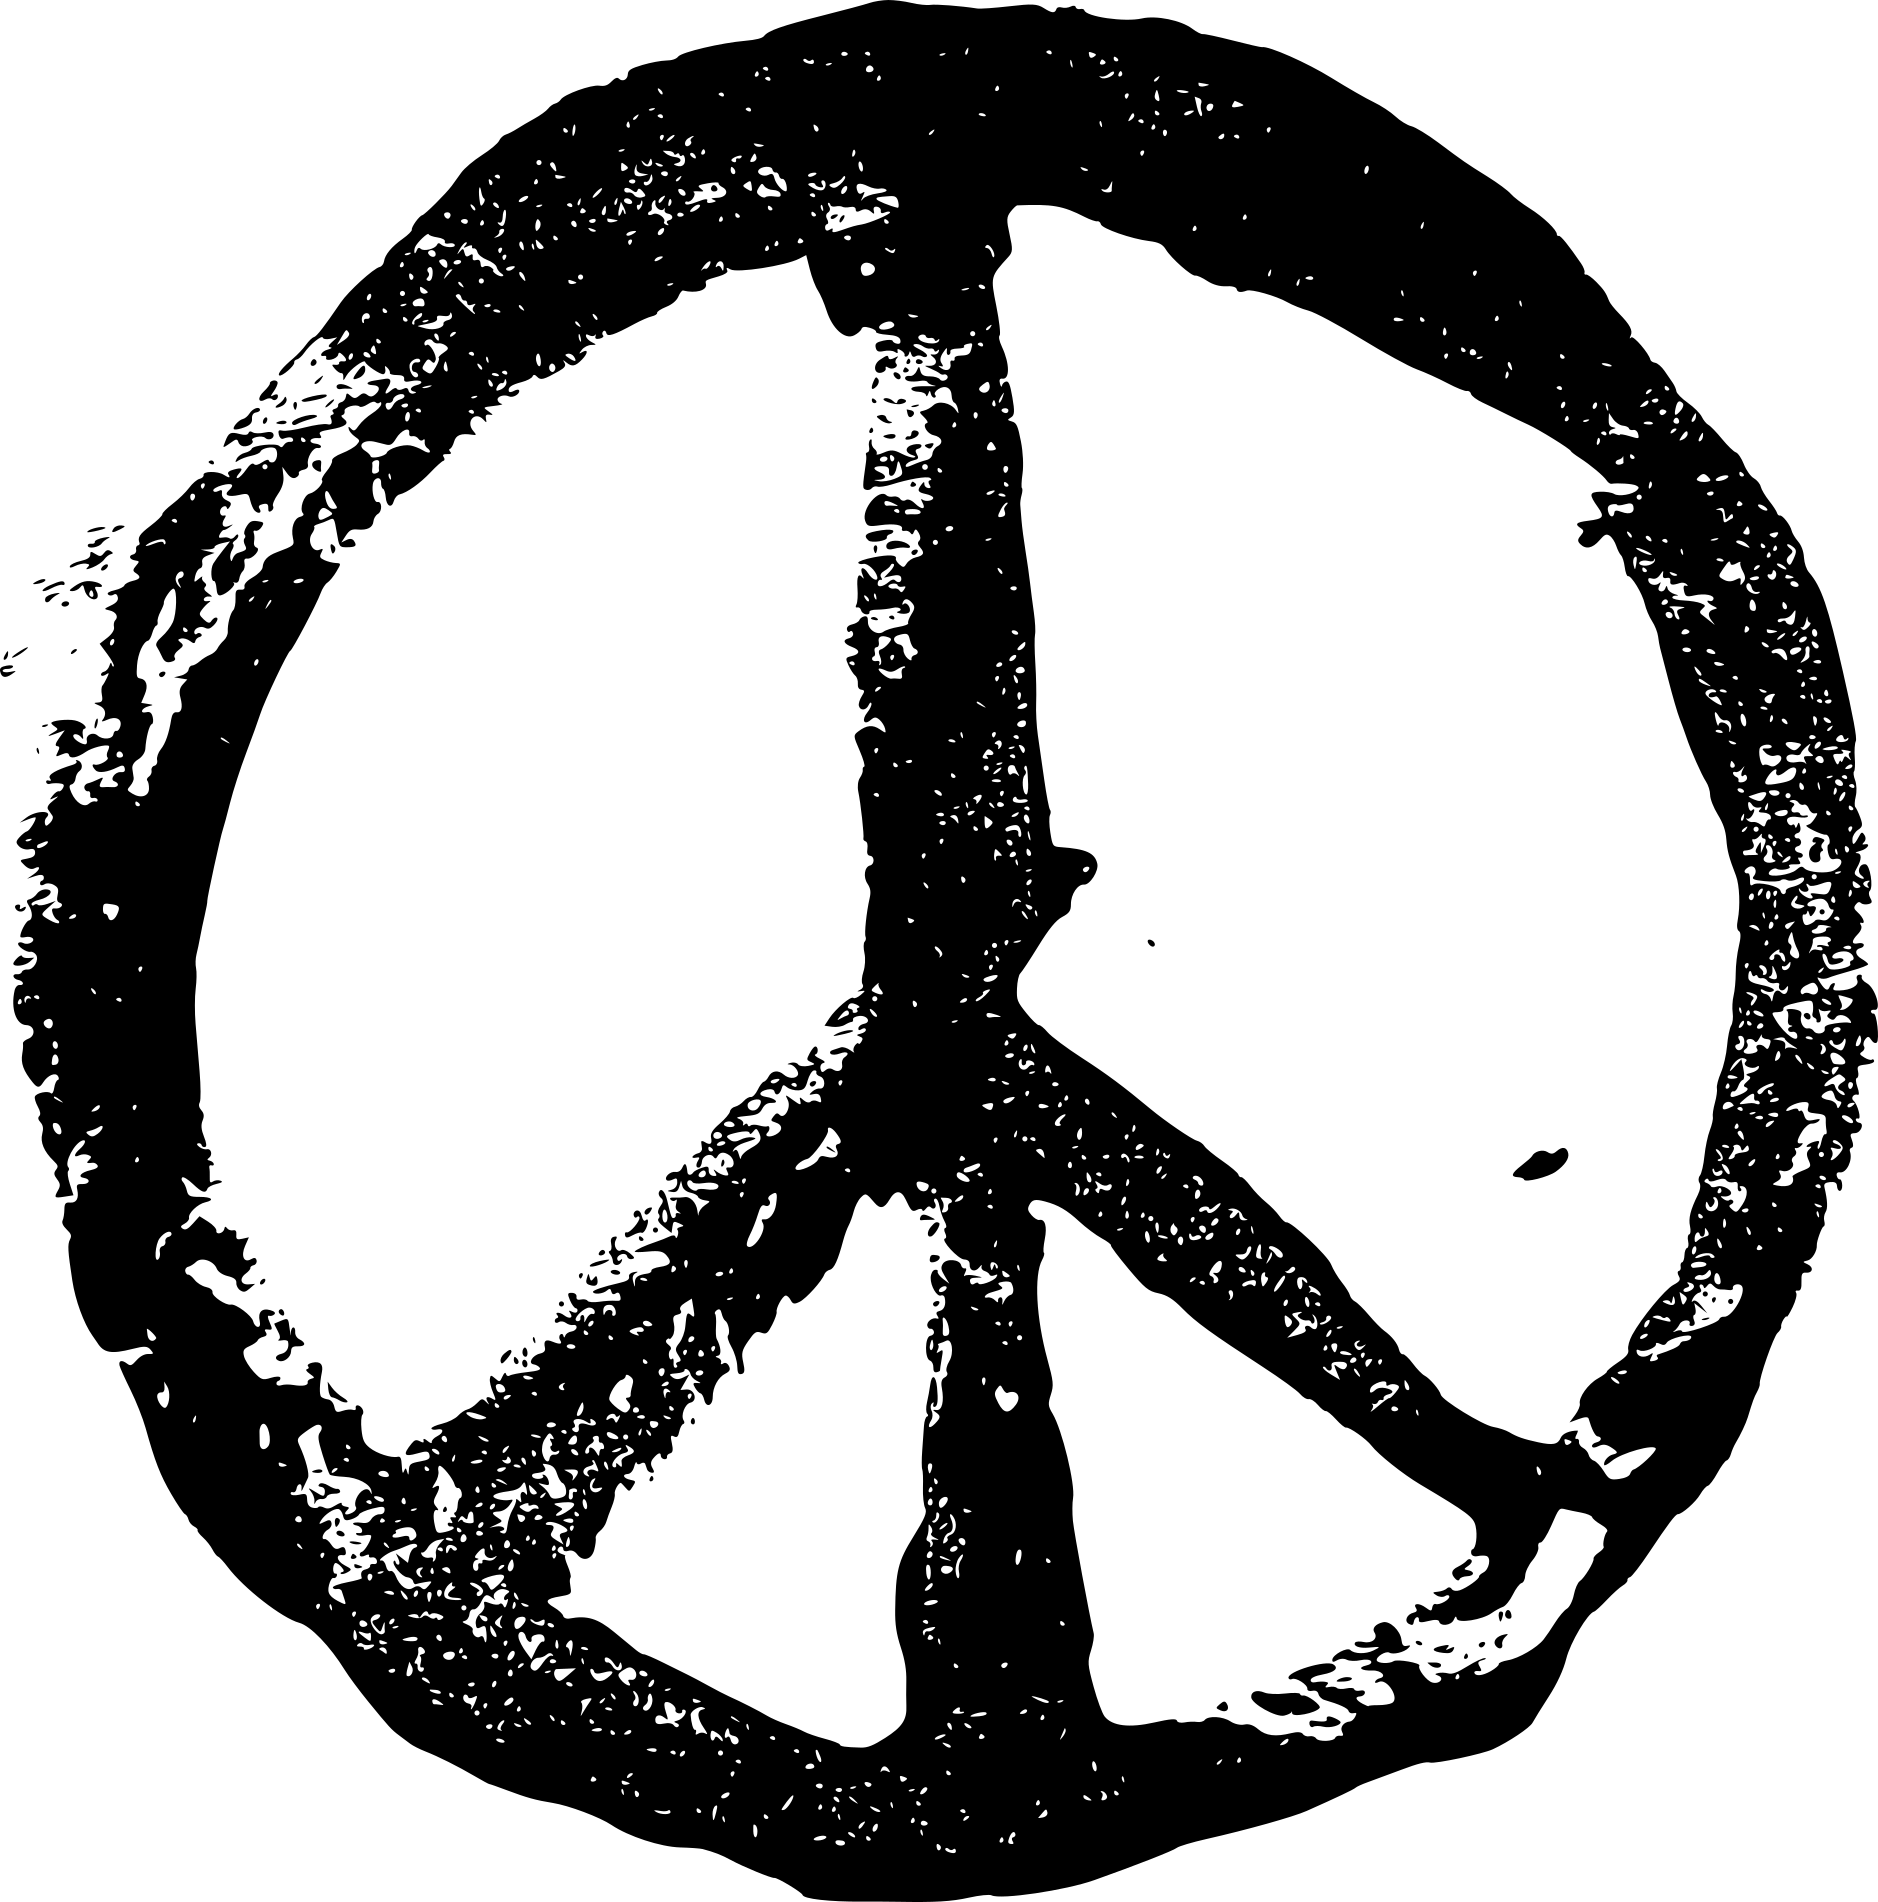 10 Grunge Stamp Peace Symbol (PNG Transparent) | OnlyGFX.com